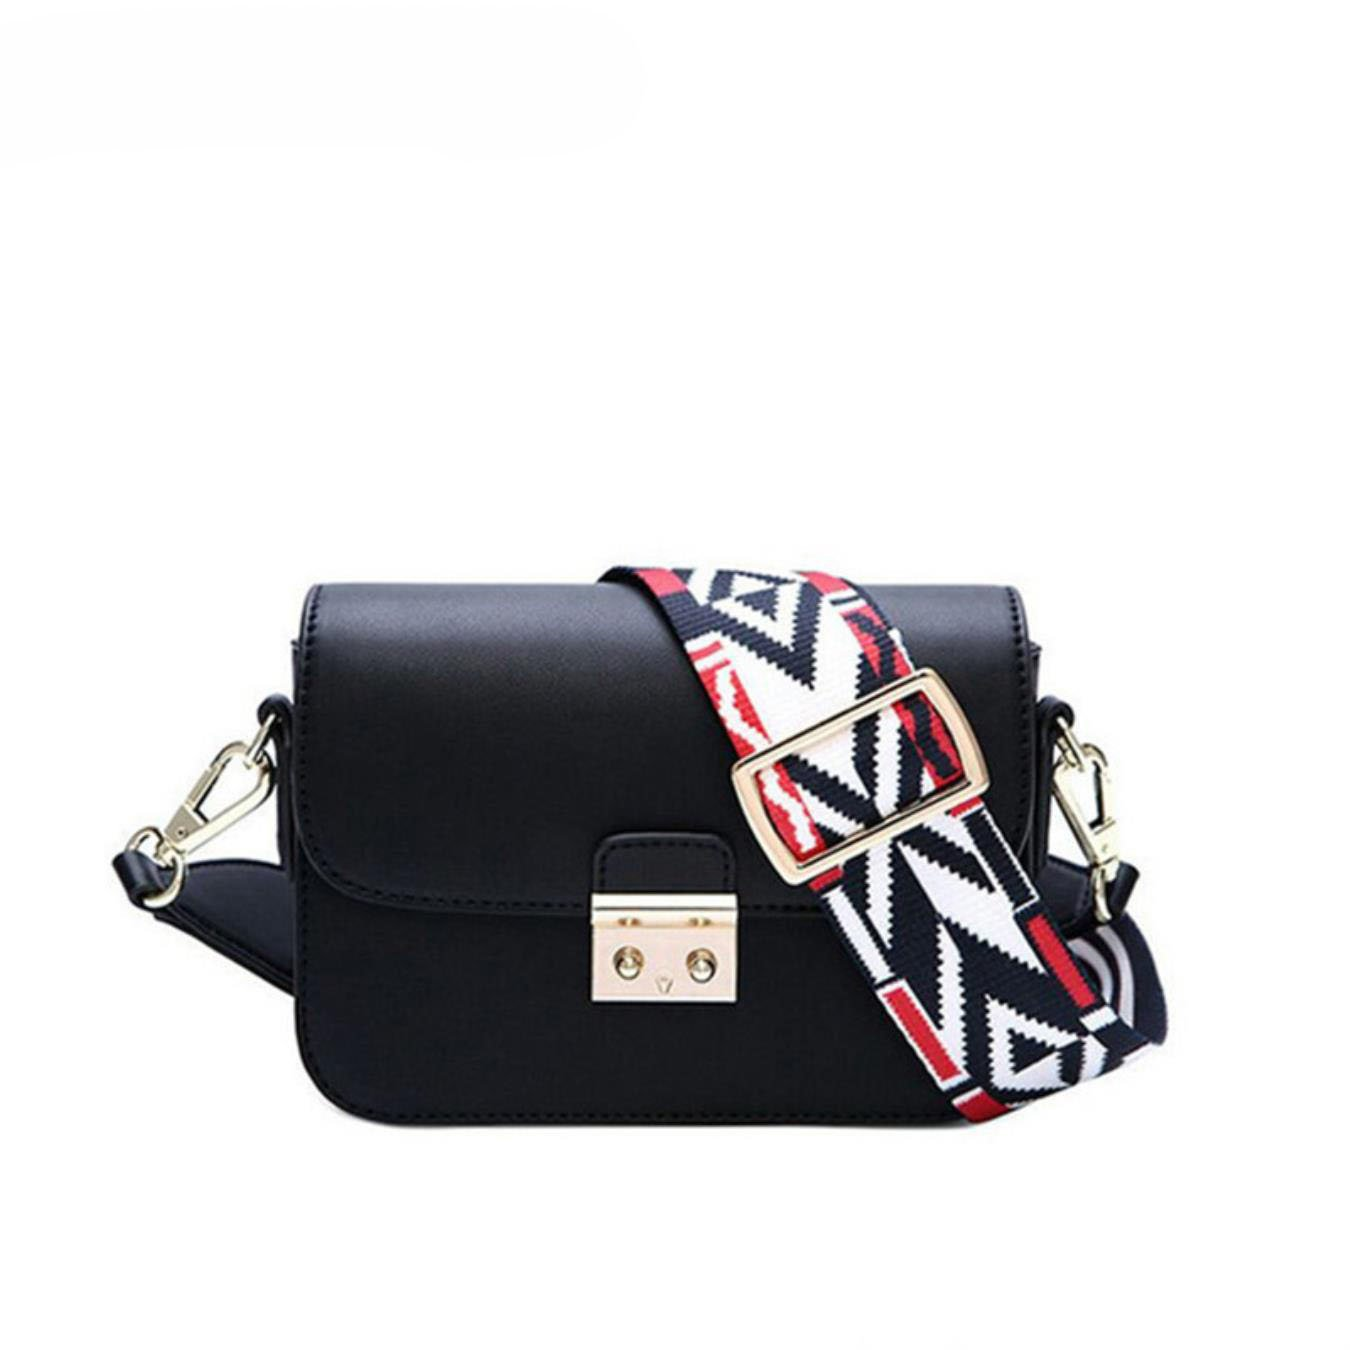 Amazon.com: Fashion Bag Crossbody Female Handbag Classic Colorful Wide Strap Messenger Bag Leather Lady Woman Shoulder Bags: Clothing